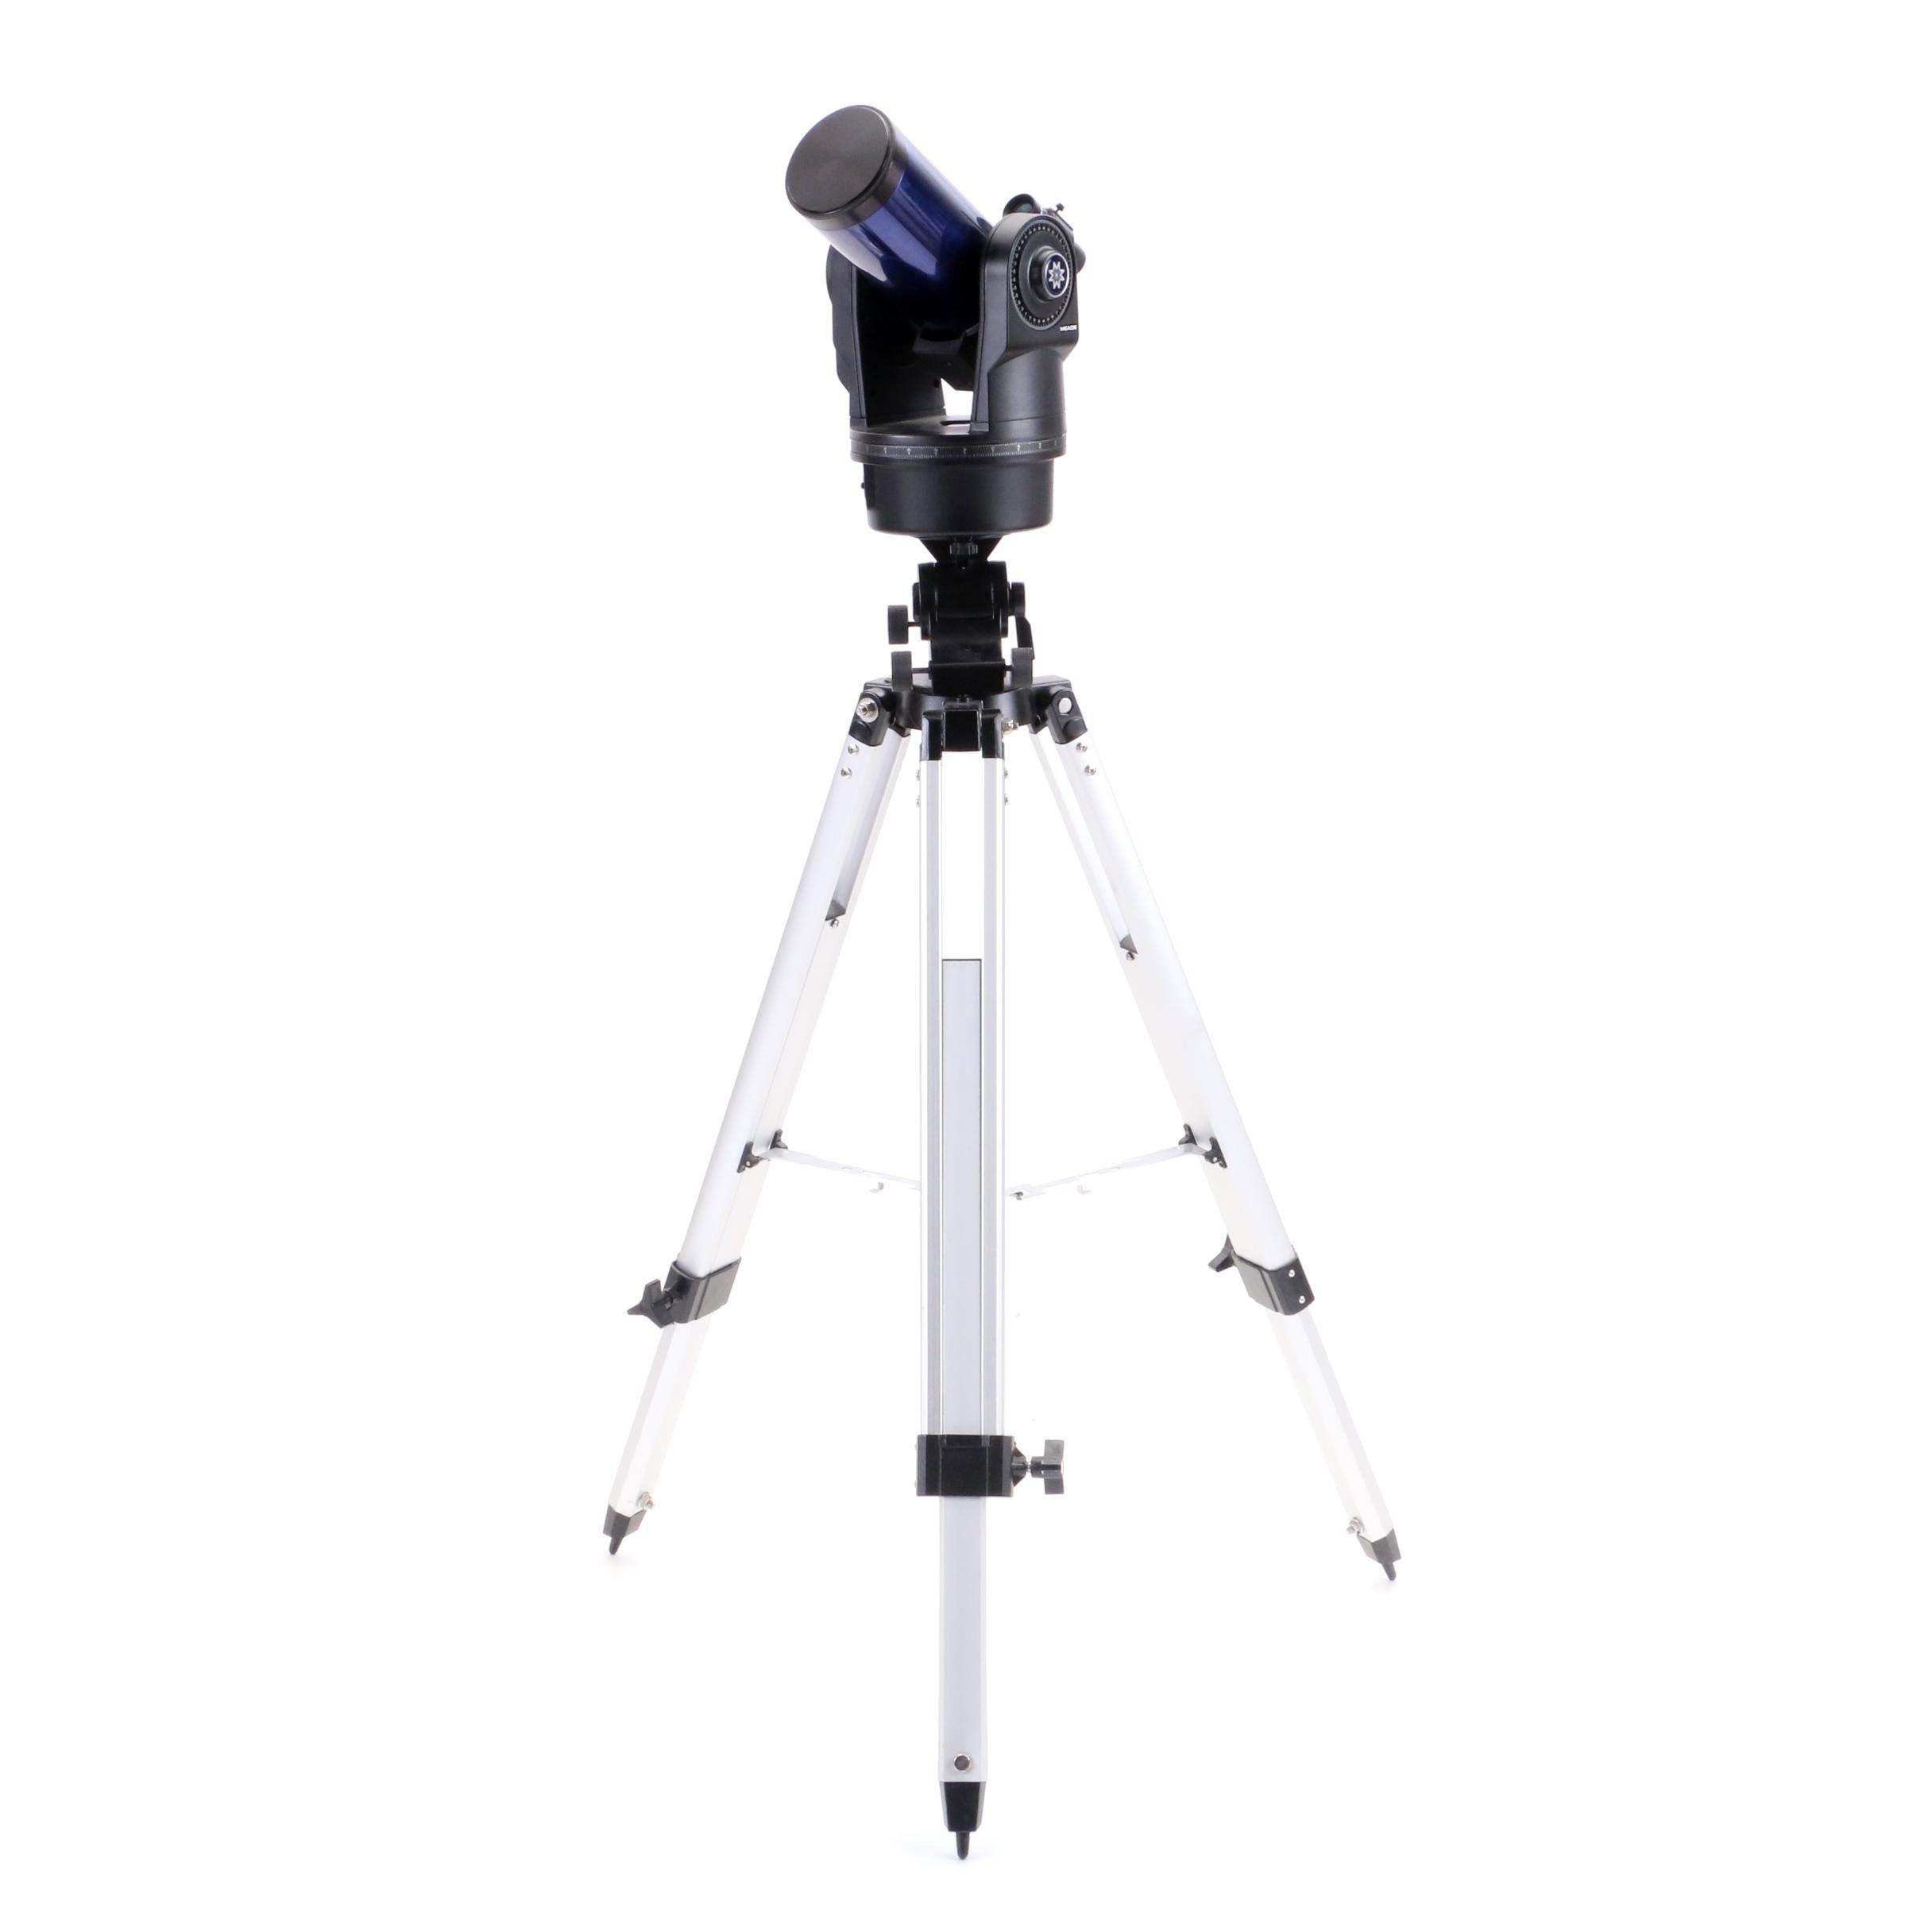 Meade ETX90 Observer Telescope with Tripod